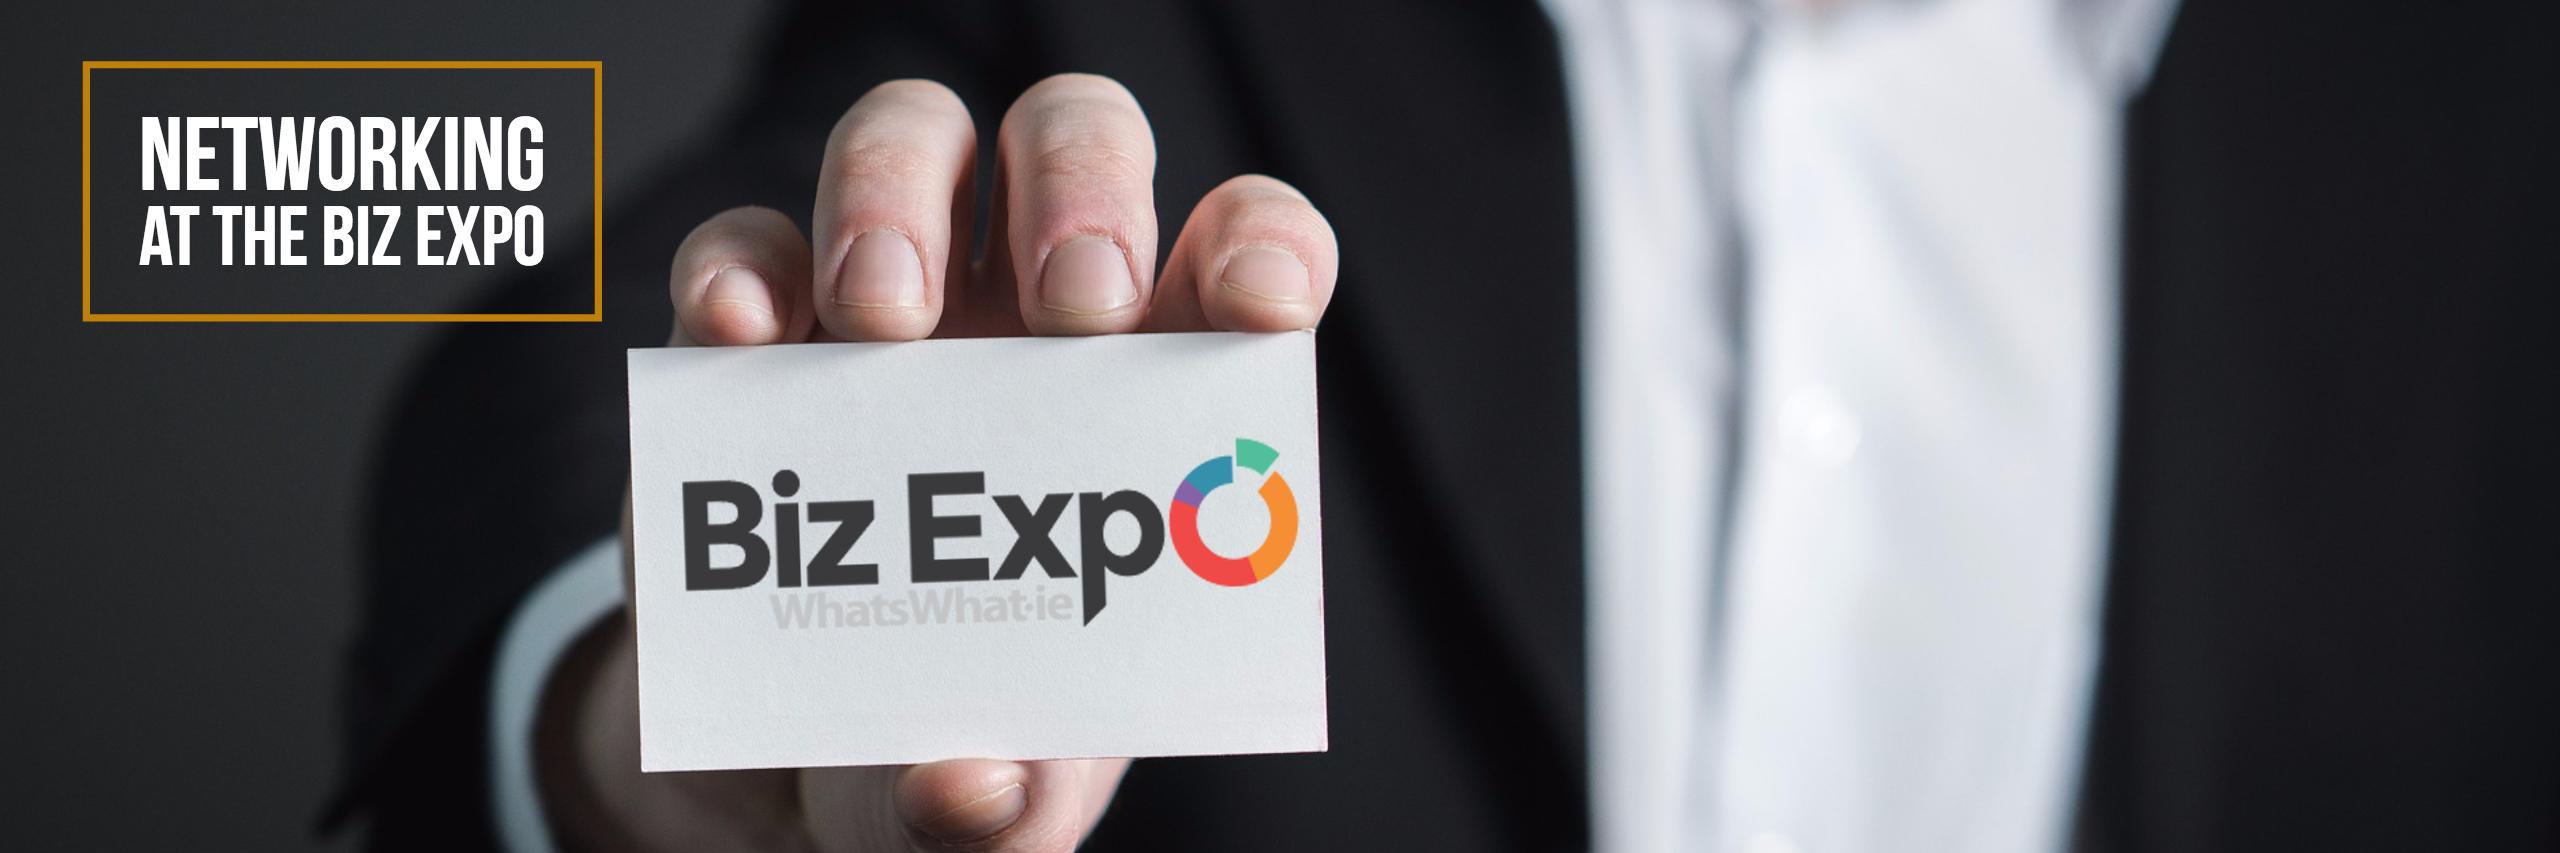 Networking Biz Expo